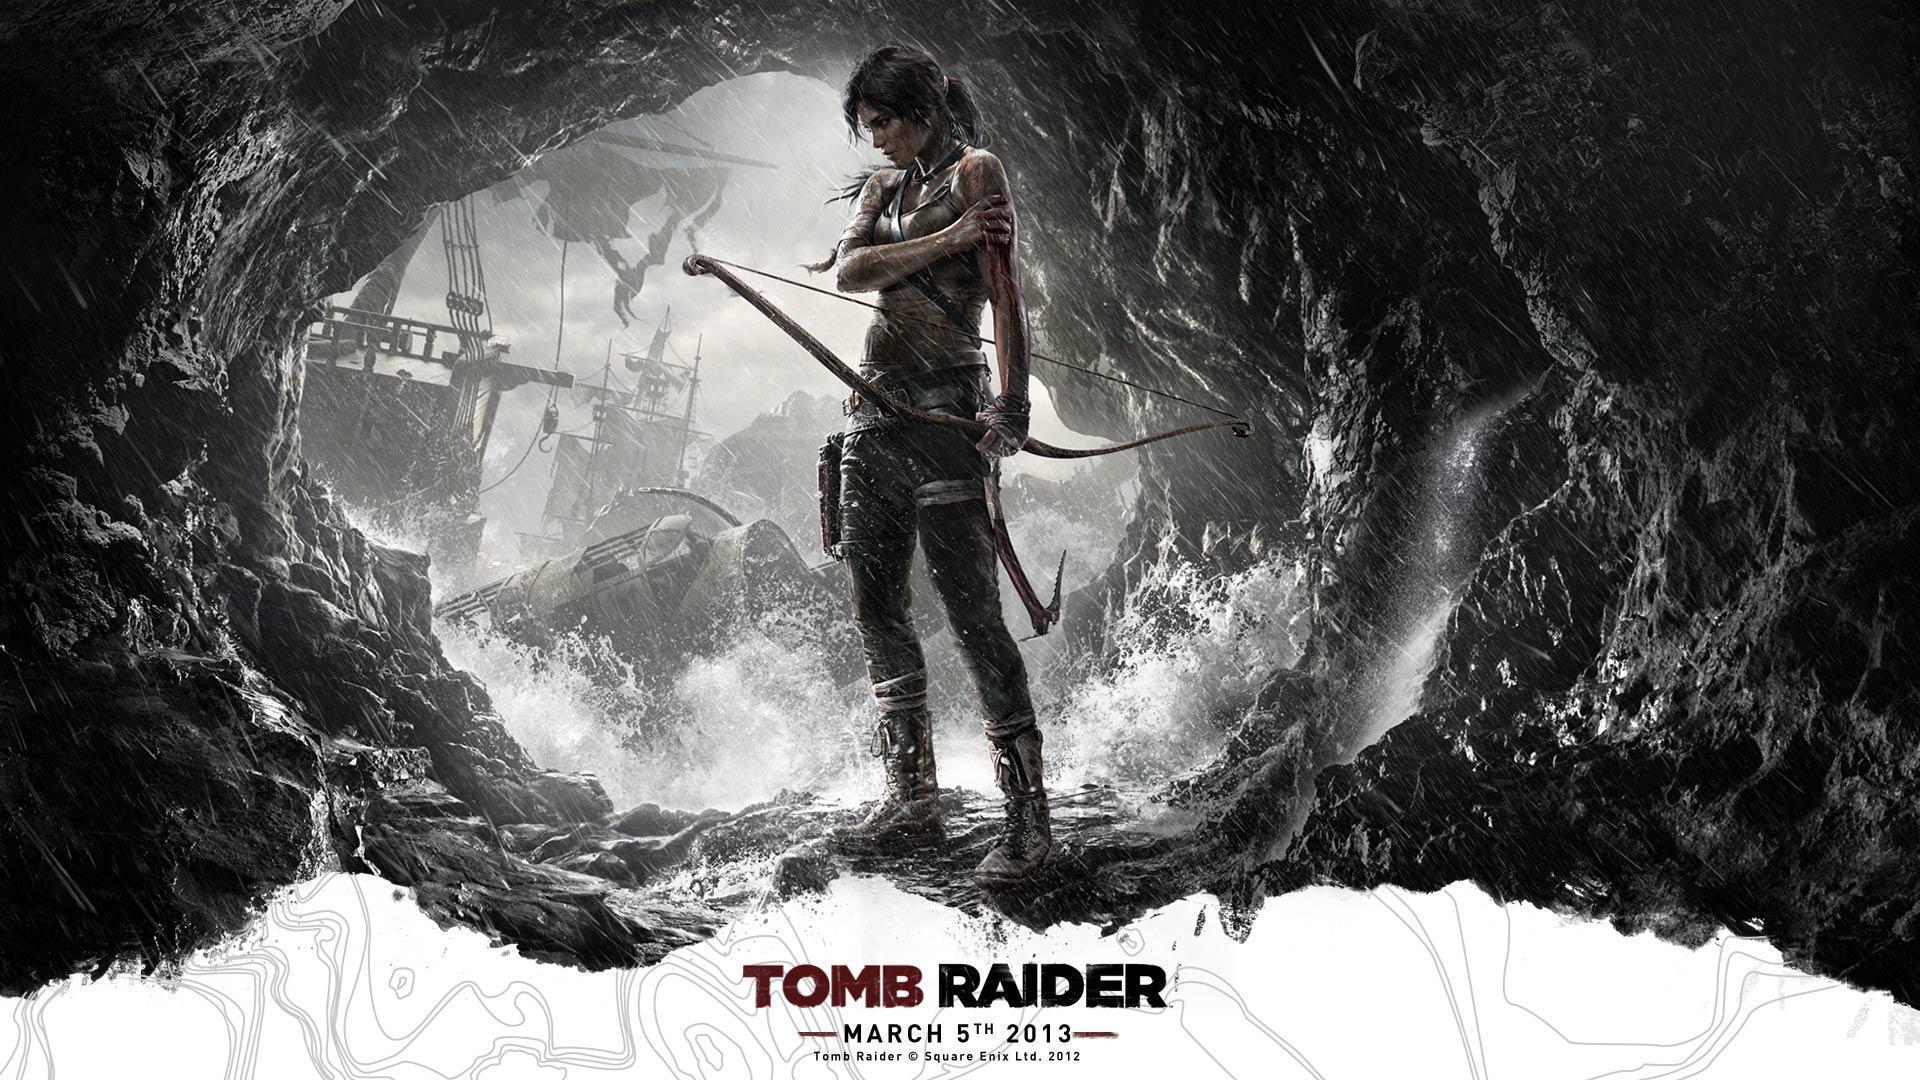 Tomb Raider 2015 Wallpapers HD - Wallpaper Cave